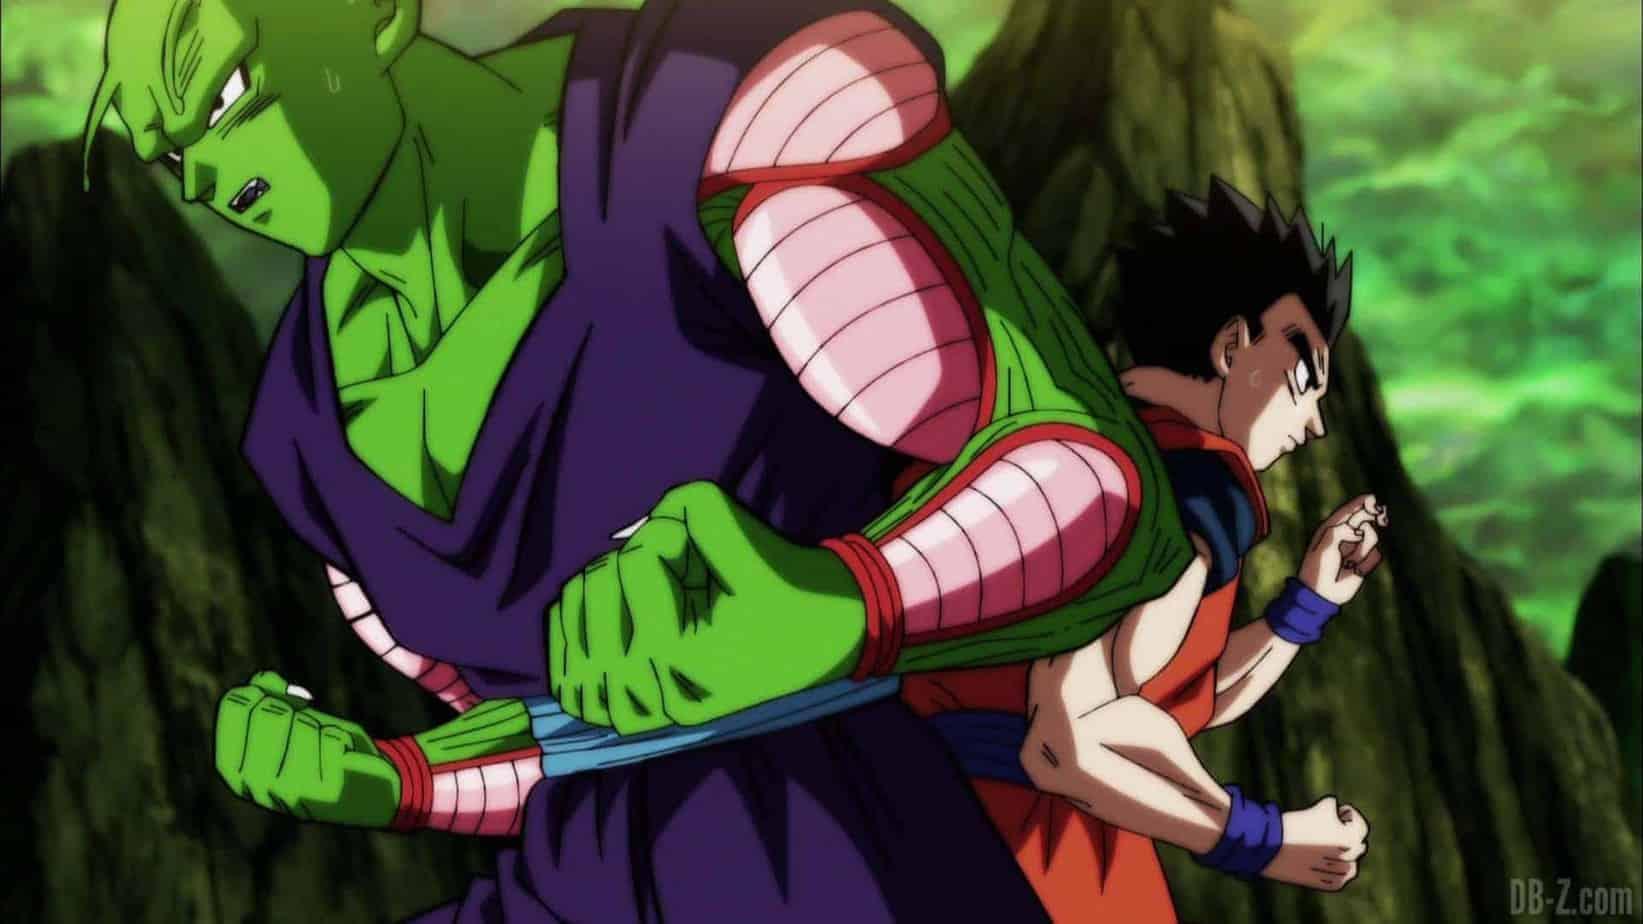 Dragon Ball Super 119 Vostfr un combat inévitable la féroce attaque furtive 4